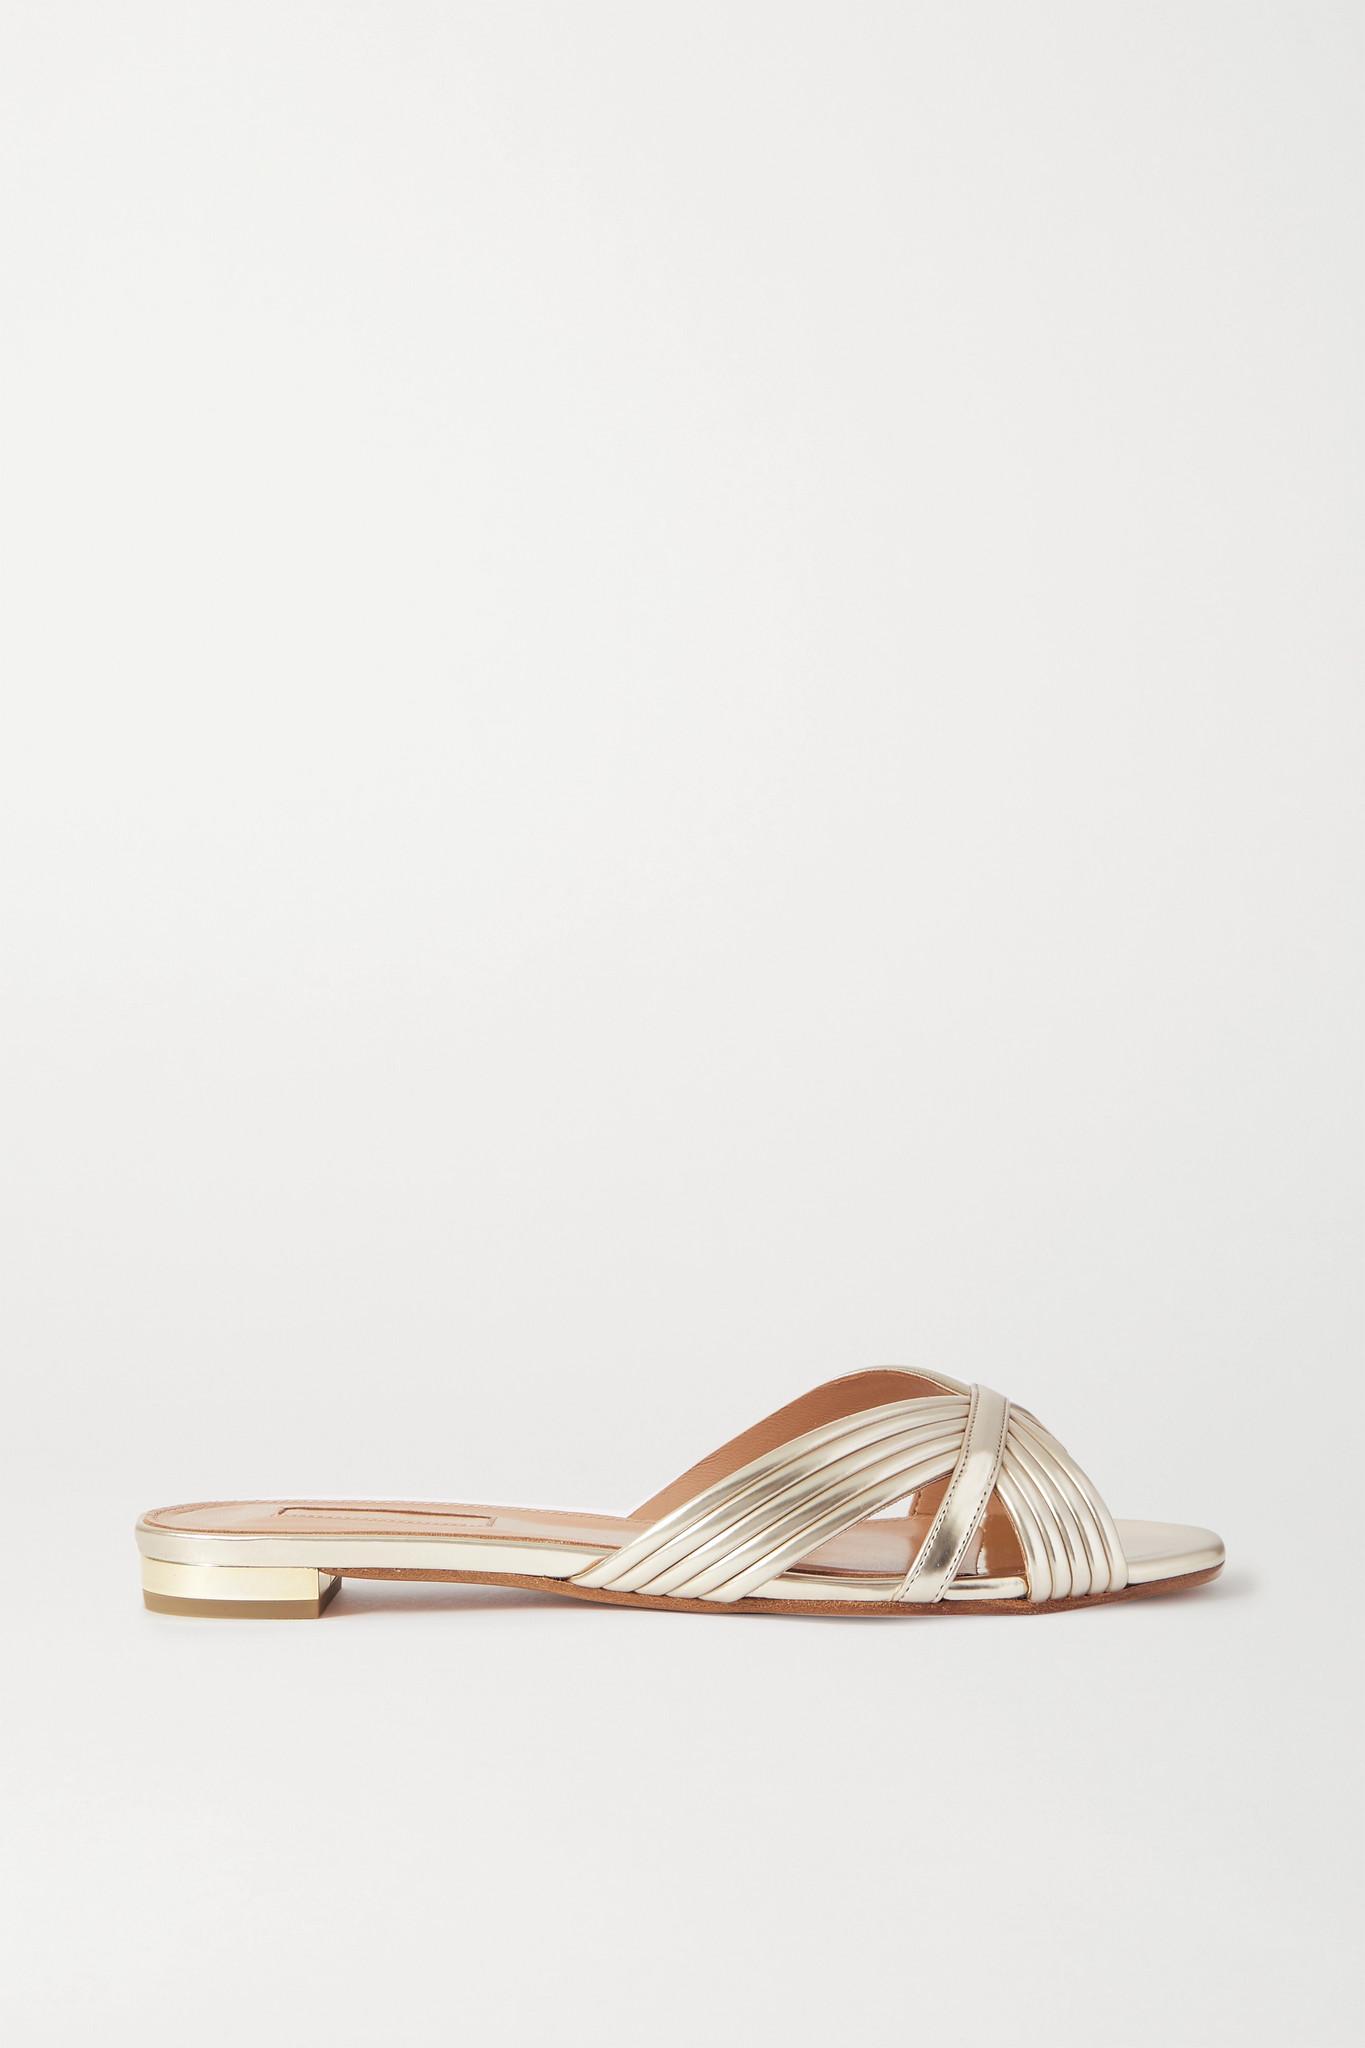 AQUAZZURA - Sundance 金属感纯素皮革拖鞋 - 金属色 - IT35